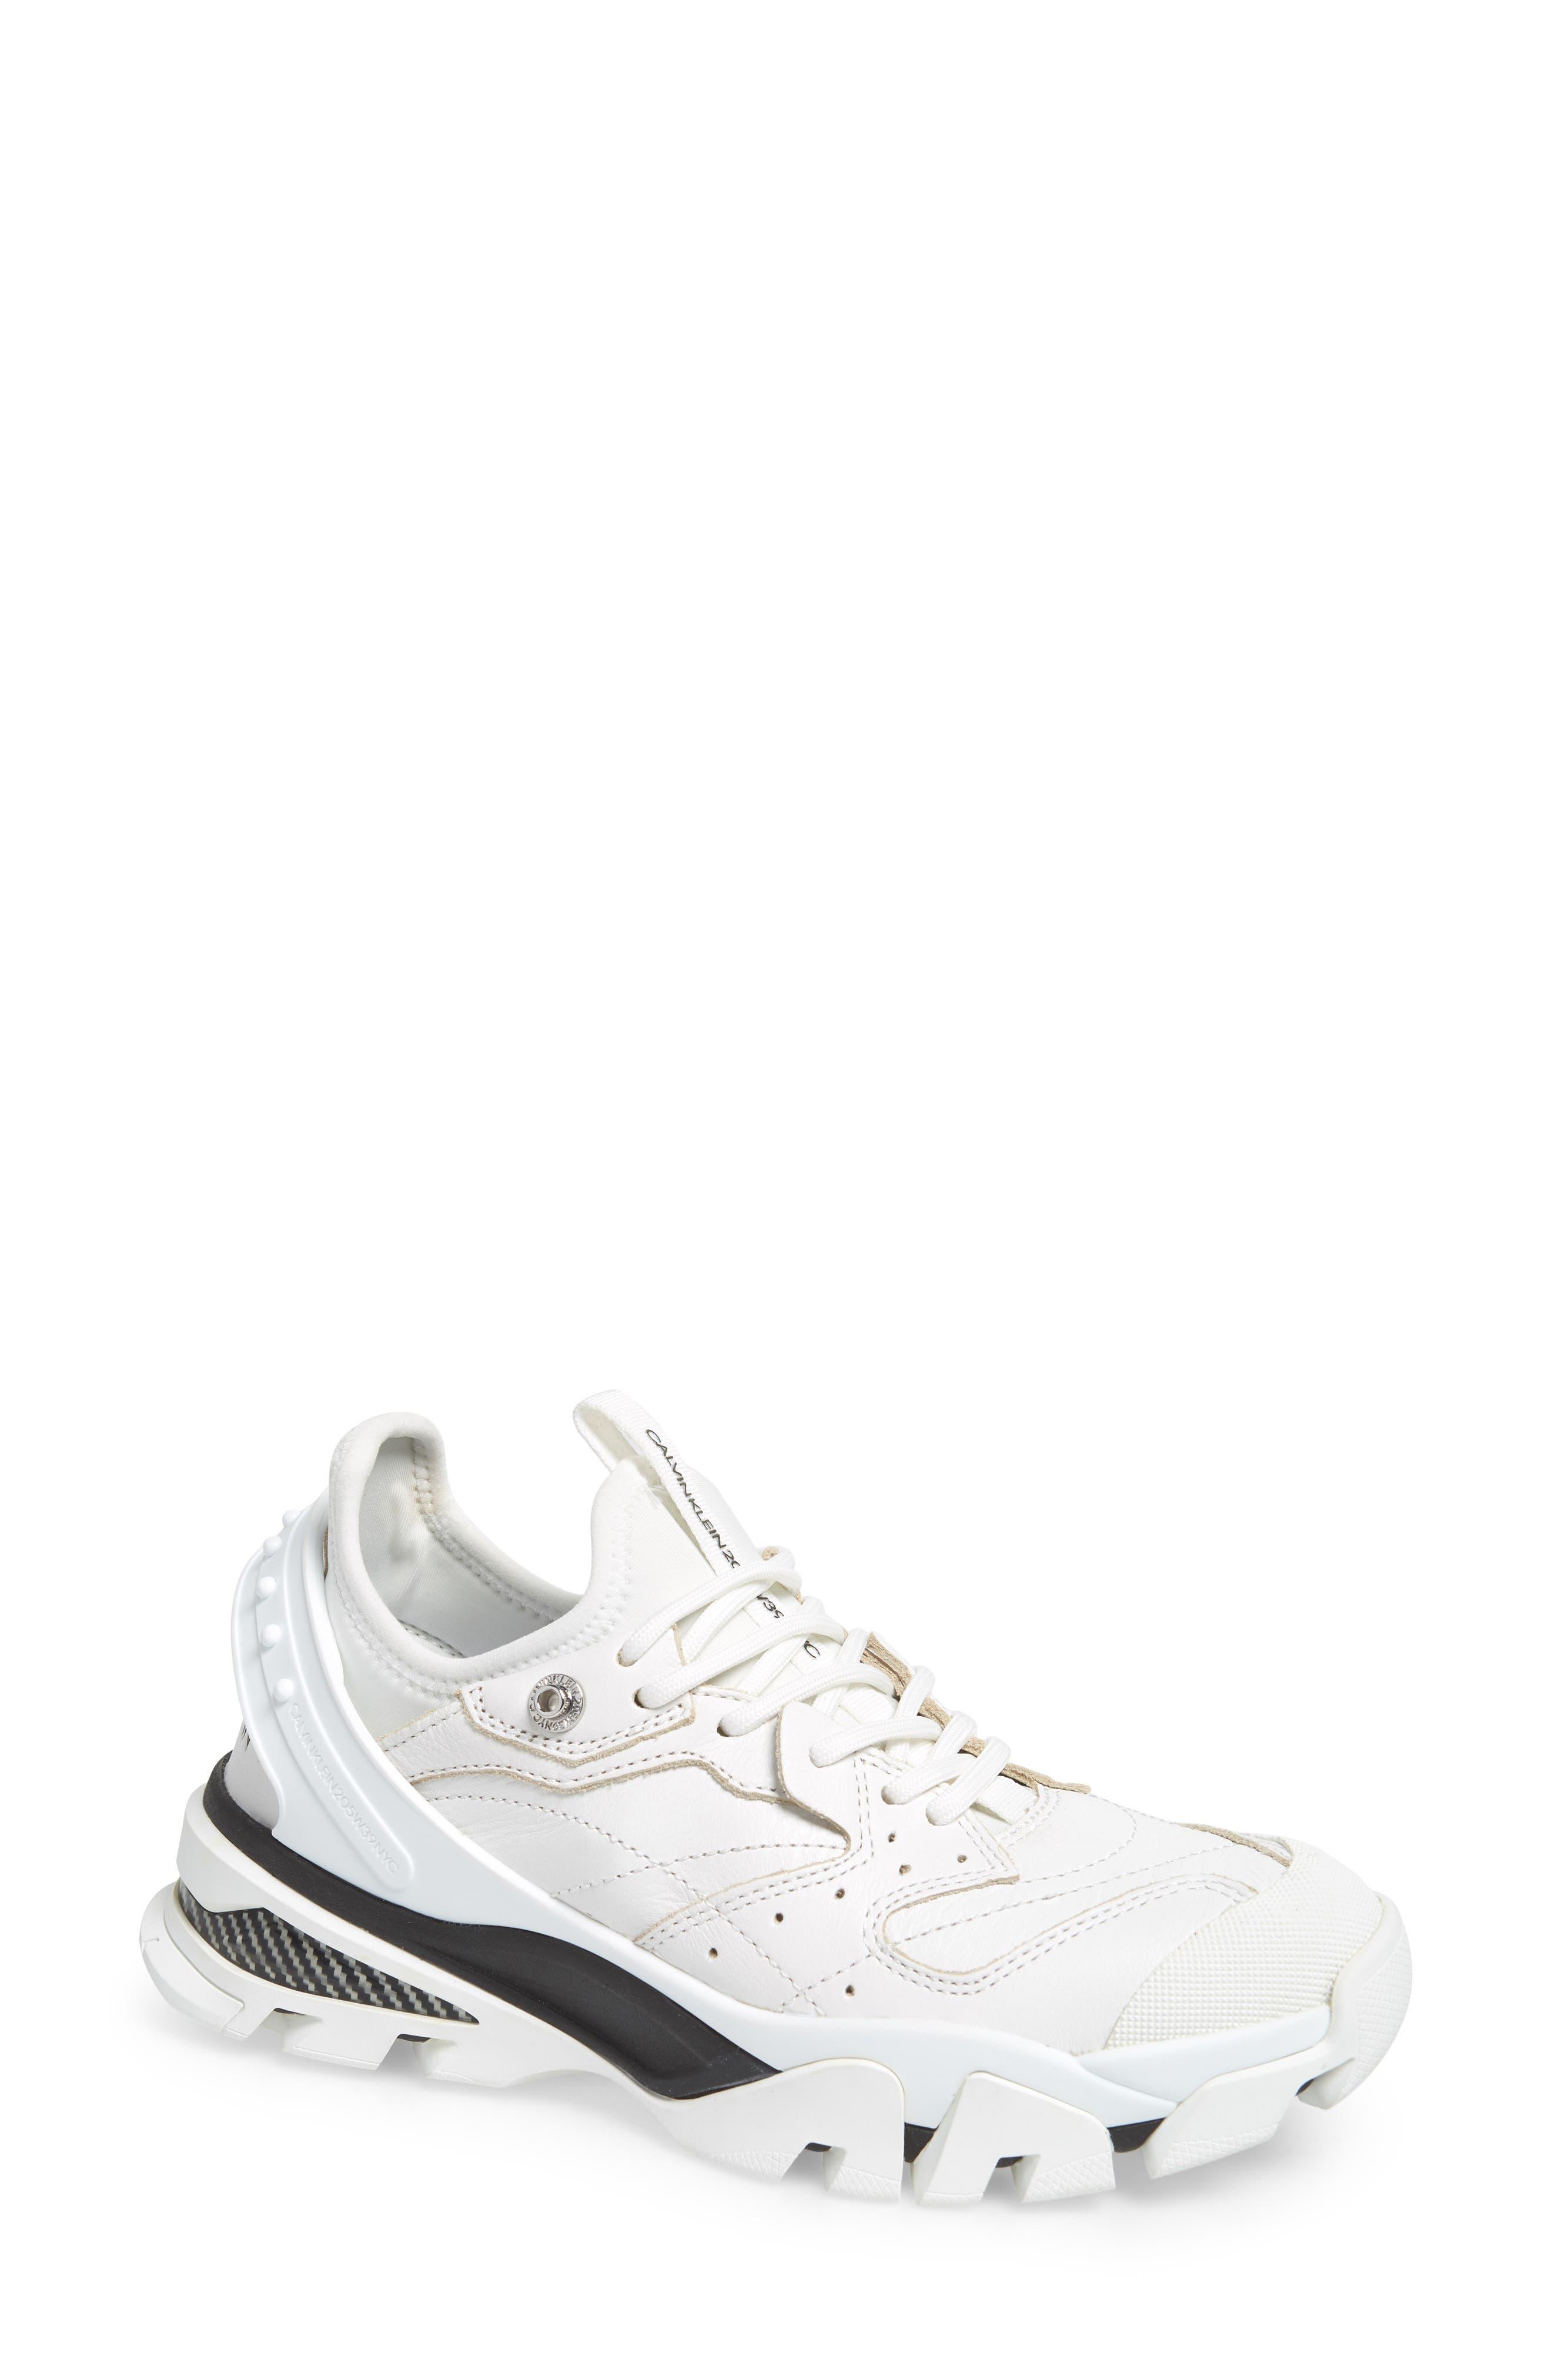 CALVIN KLEIN 205W39NYC Carla Sneaker, Main, color, WHITE/ BLACK/ BLACK